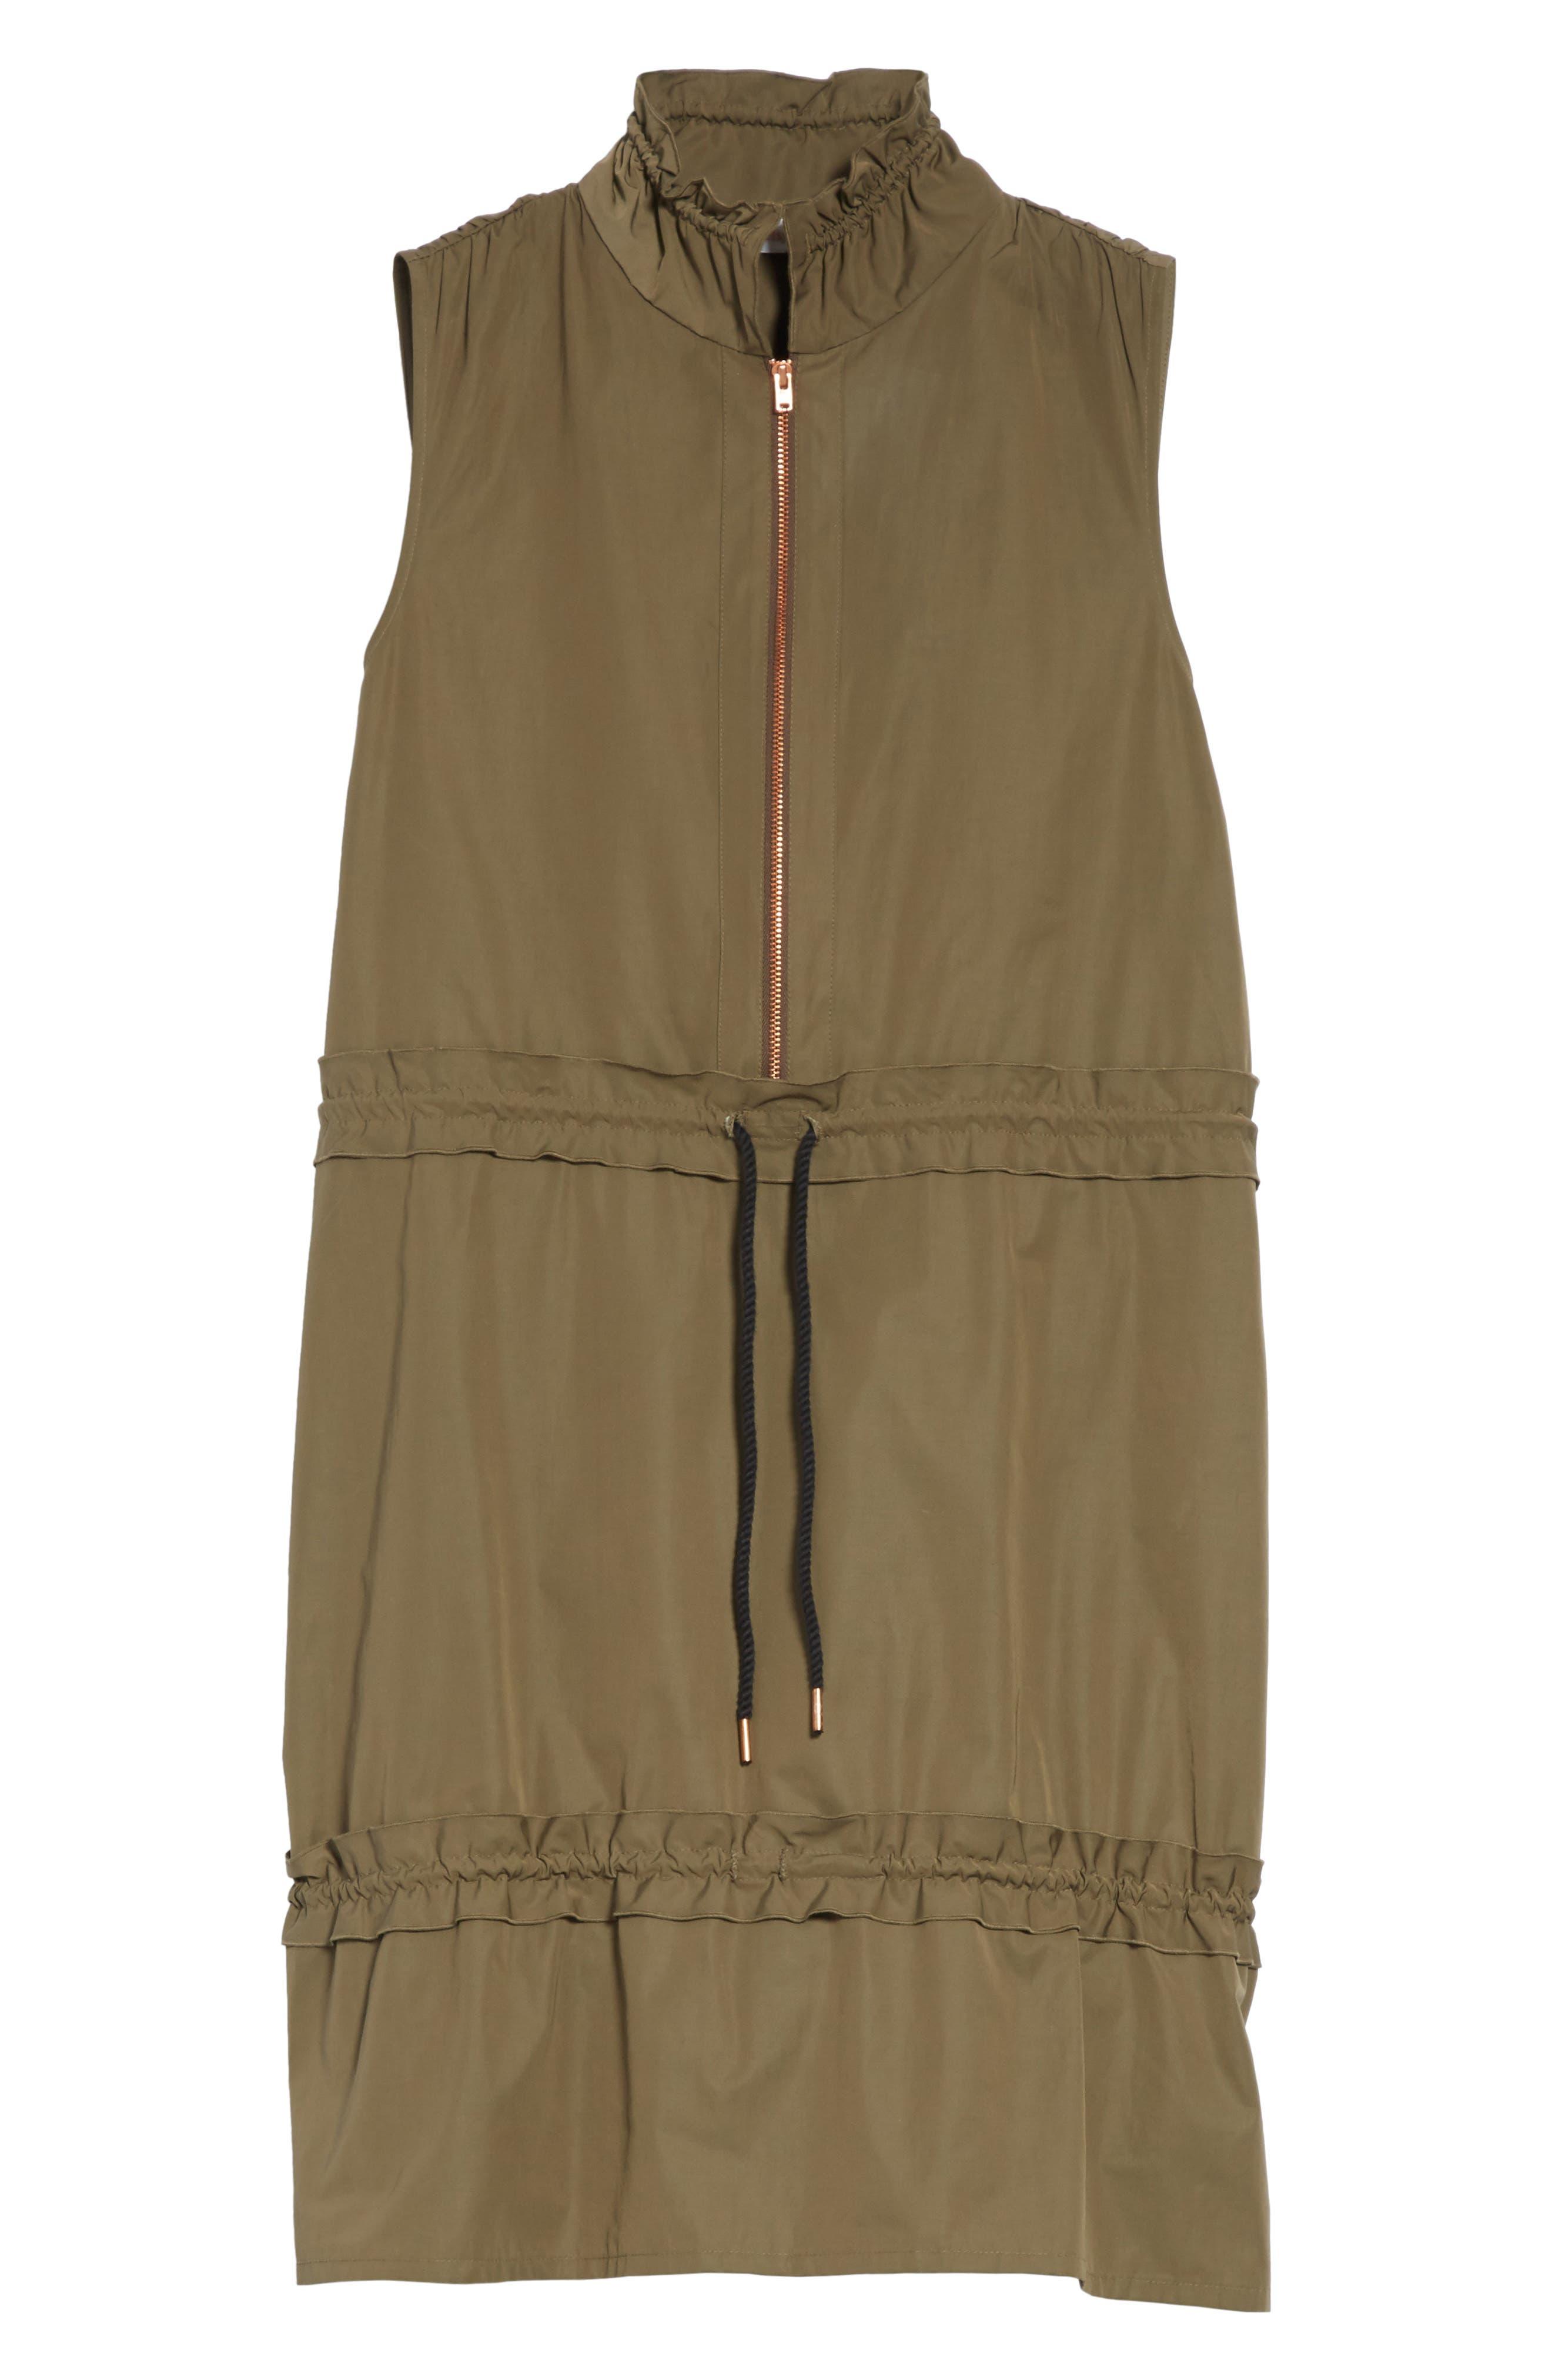 Cinch Waist Army Dress,                             Alternate thumbnail 6, color,                             Cacao Brown